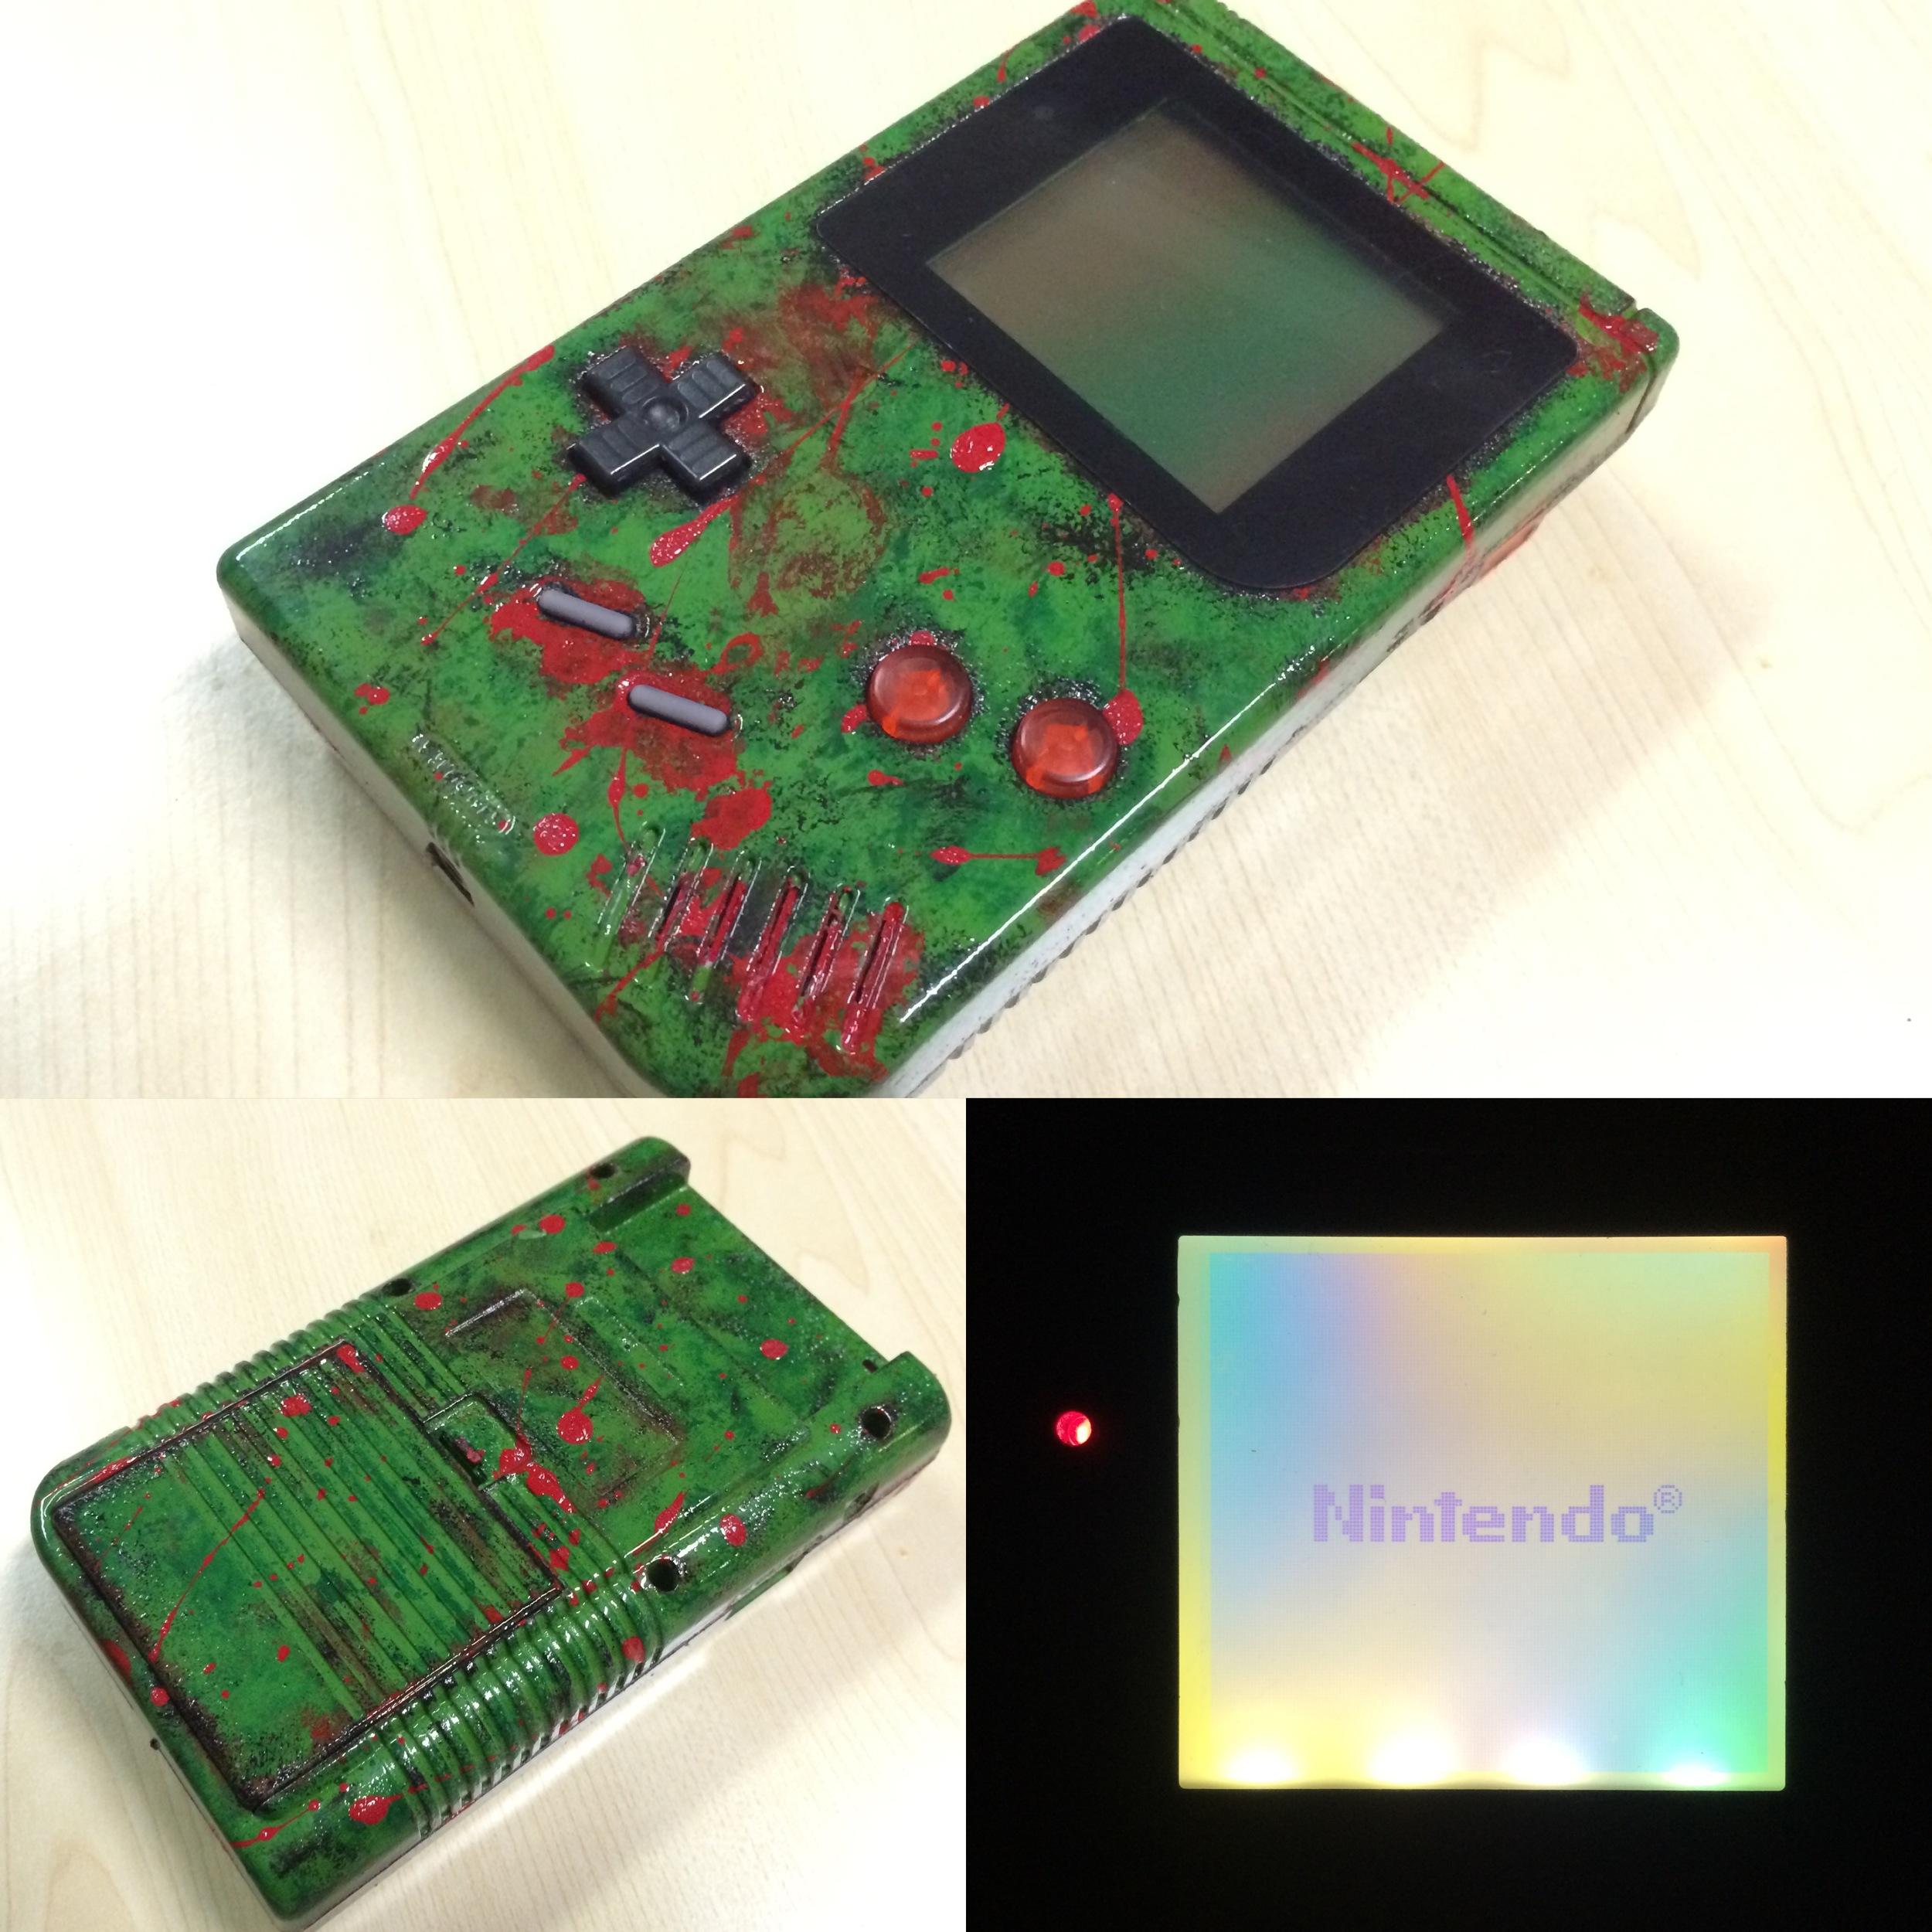 Custom Painted Gameboy DMG